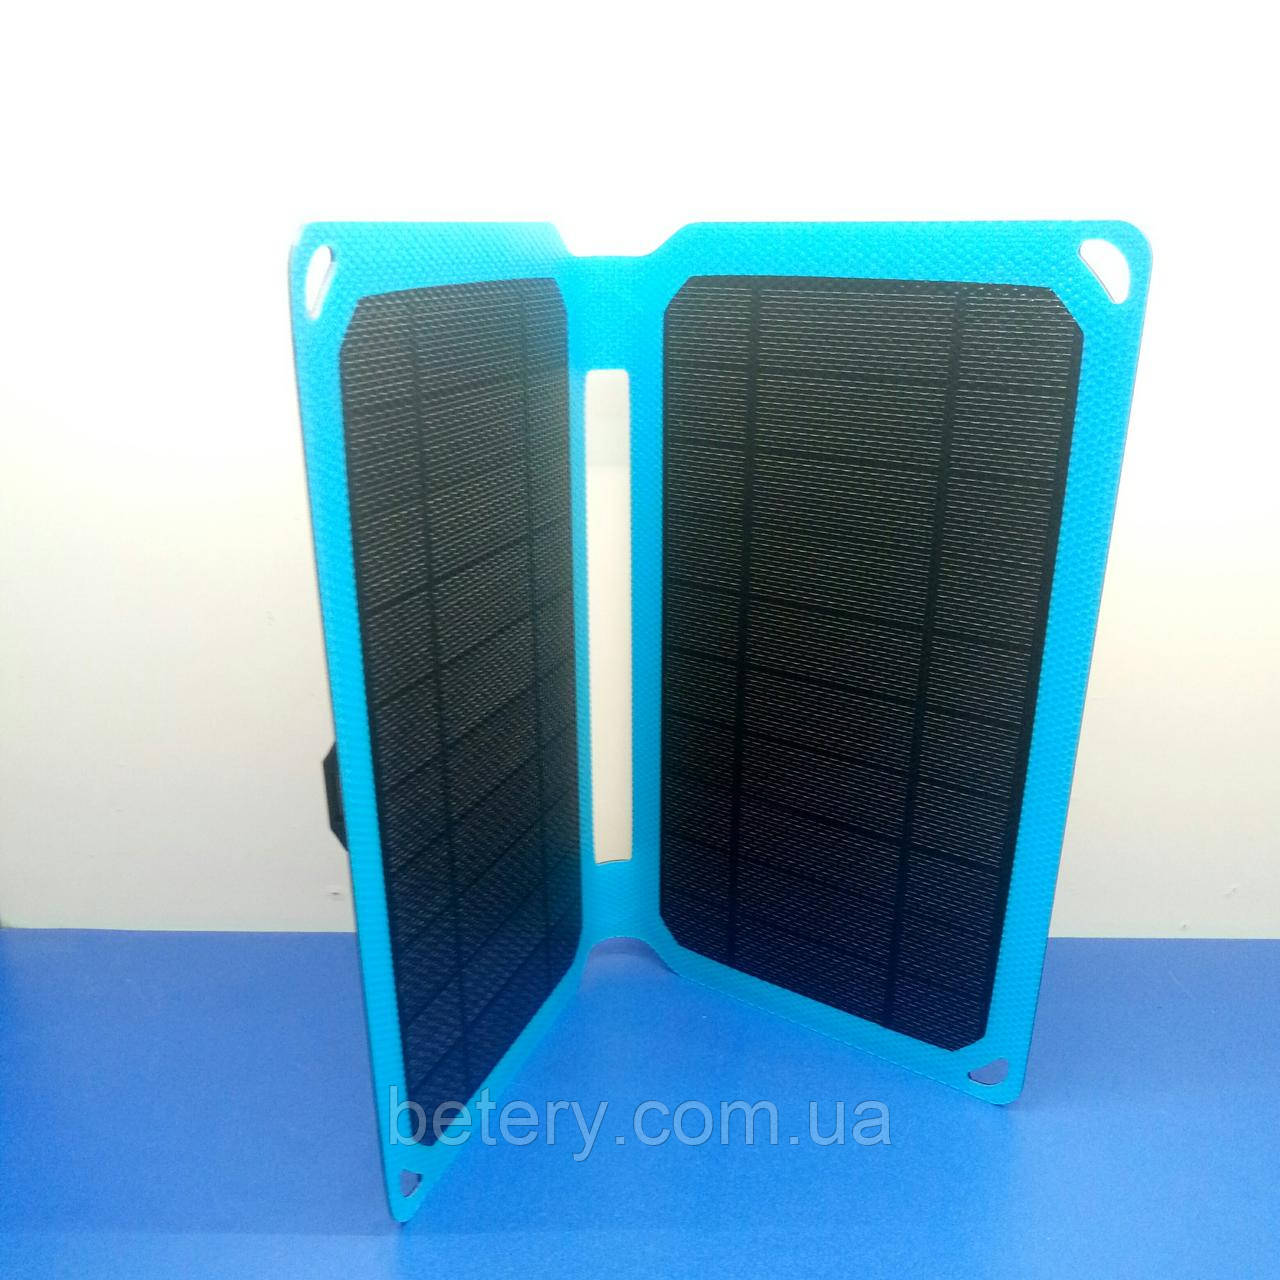 SoshineSC10W Солнечная панель 10W